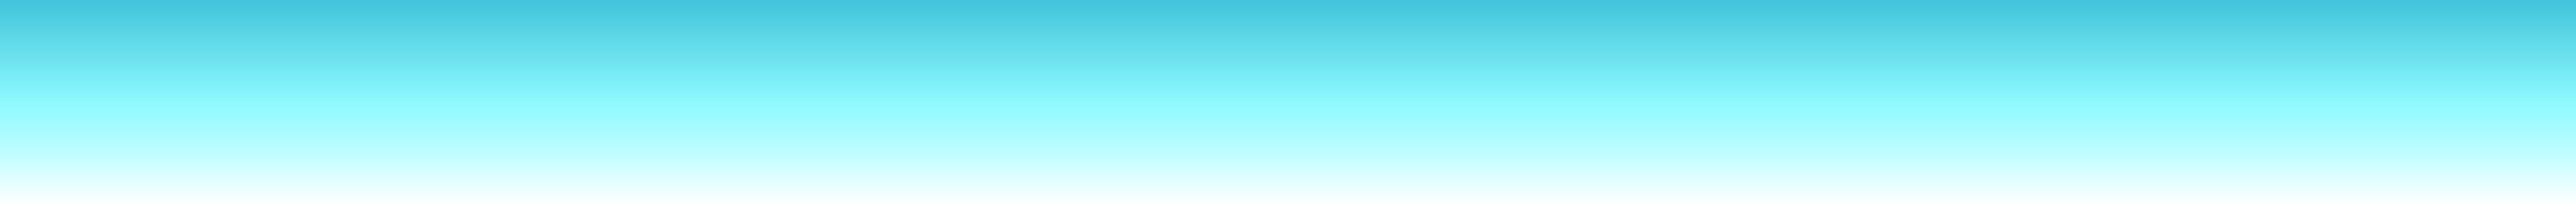 banner-gradient